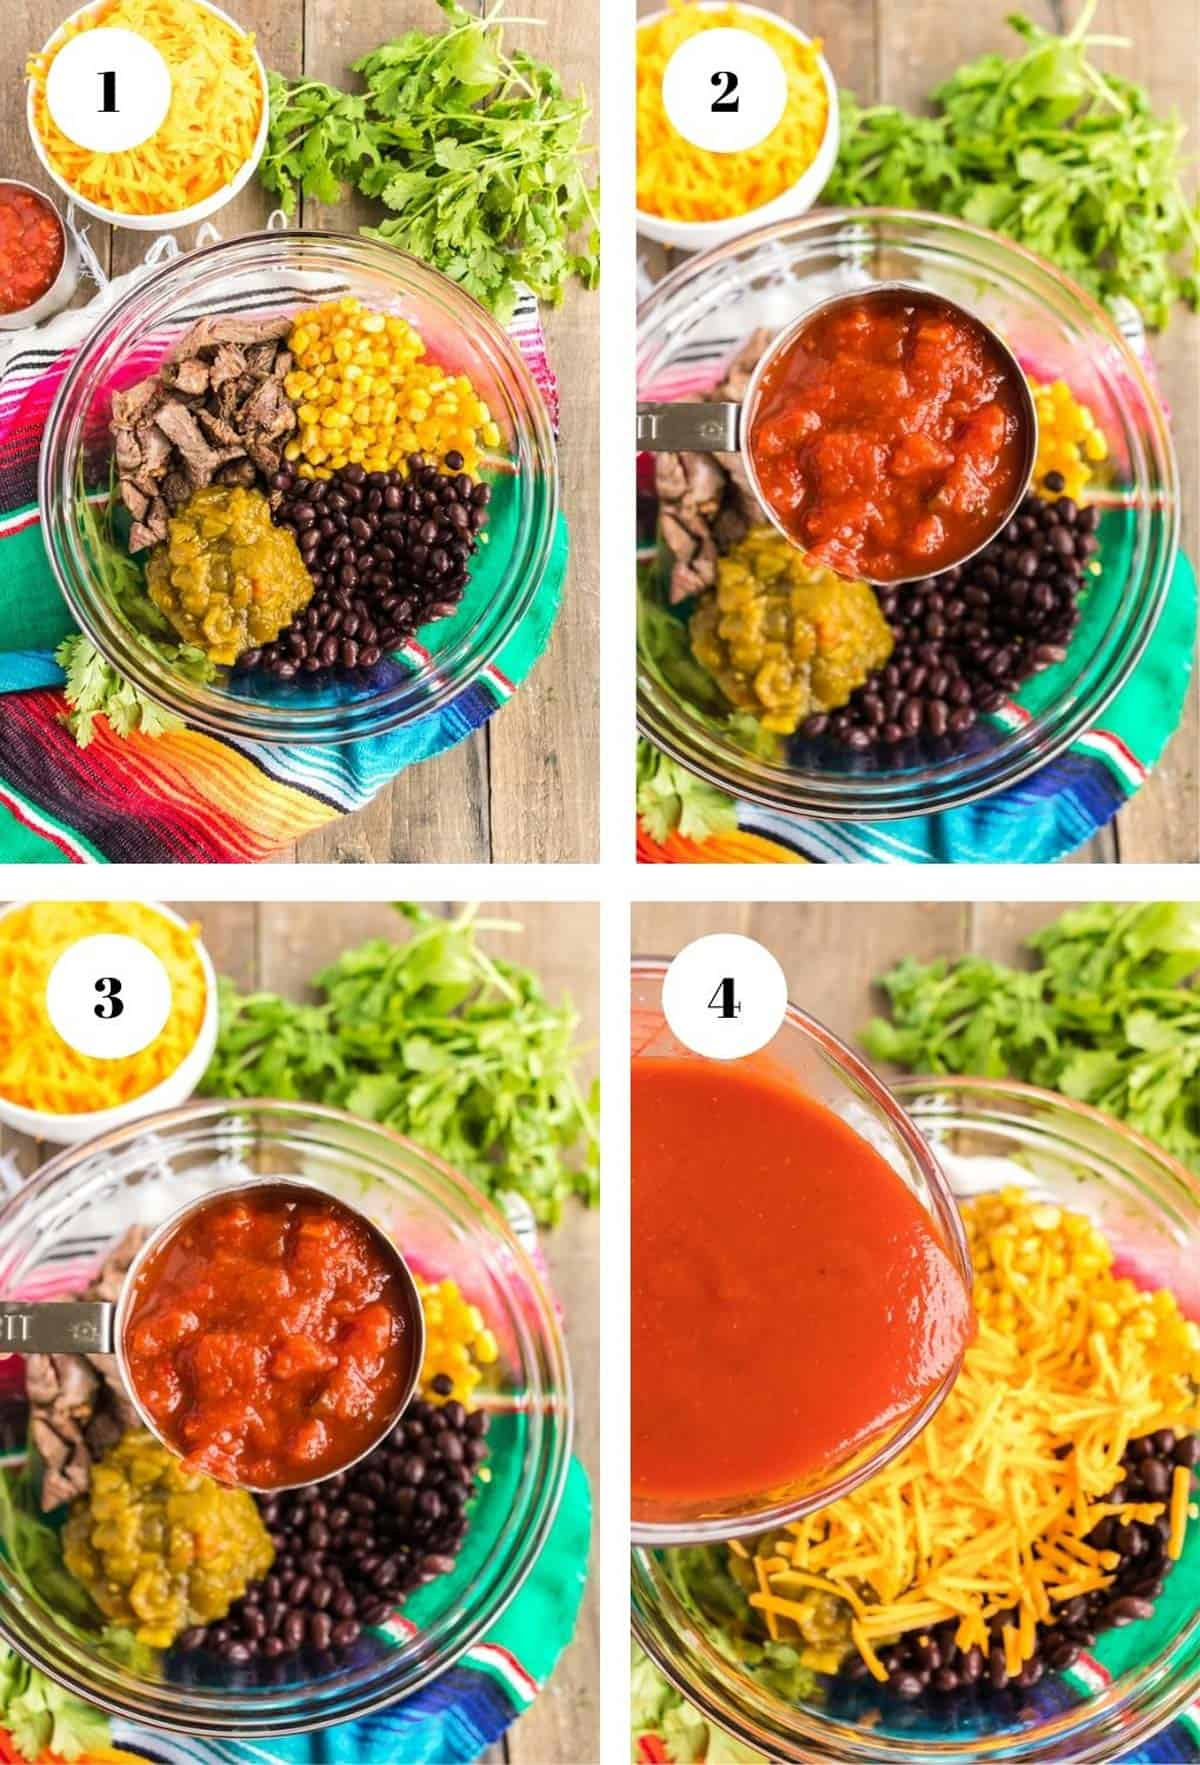 Pouring ingredients into a bowl to make enchiladas.